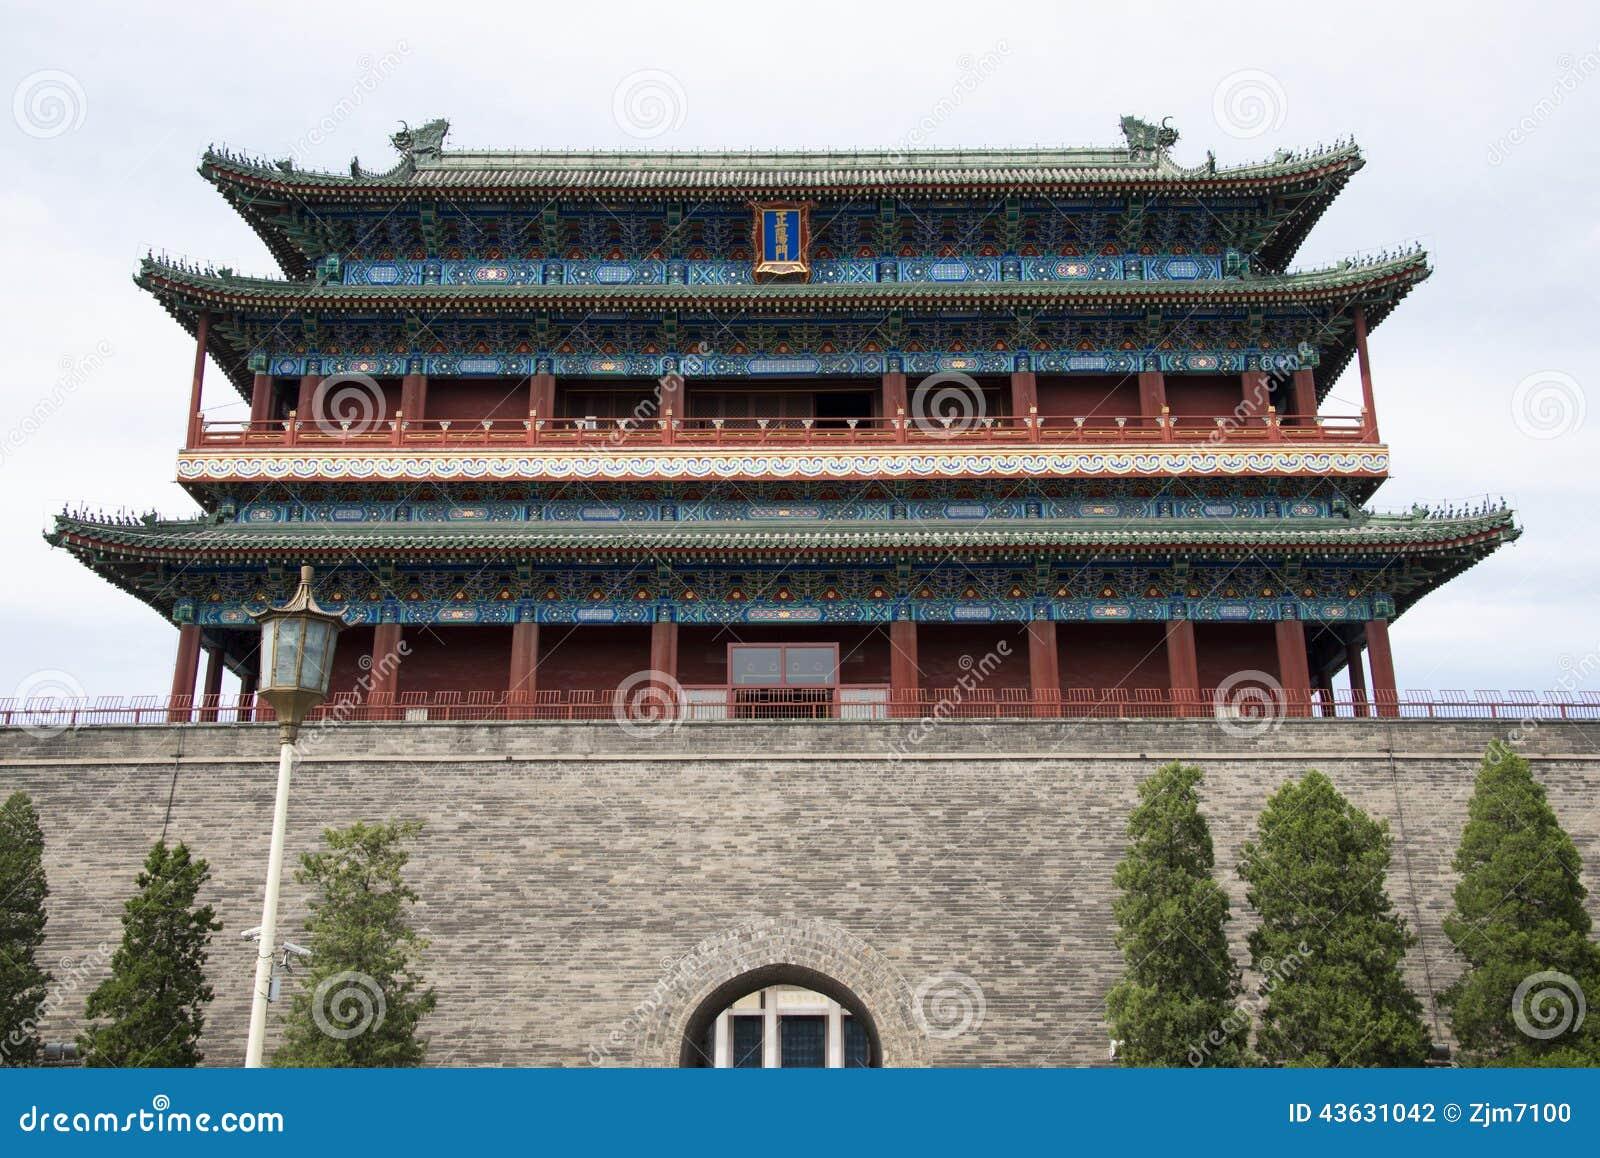 asiatique chine p kin porte de zhengyang porte photographie ditorial image 43631042. Black Bedroom Furniture Sets. Home Design Ideas